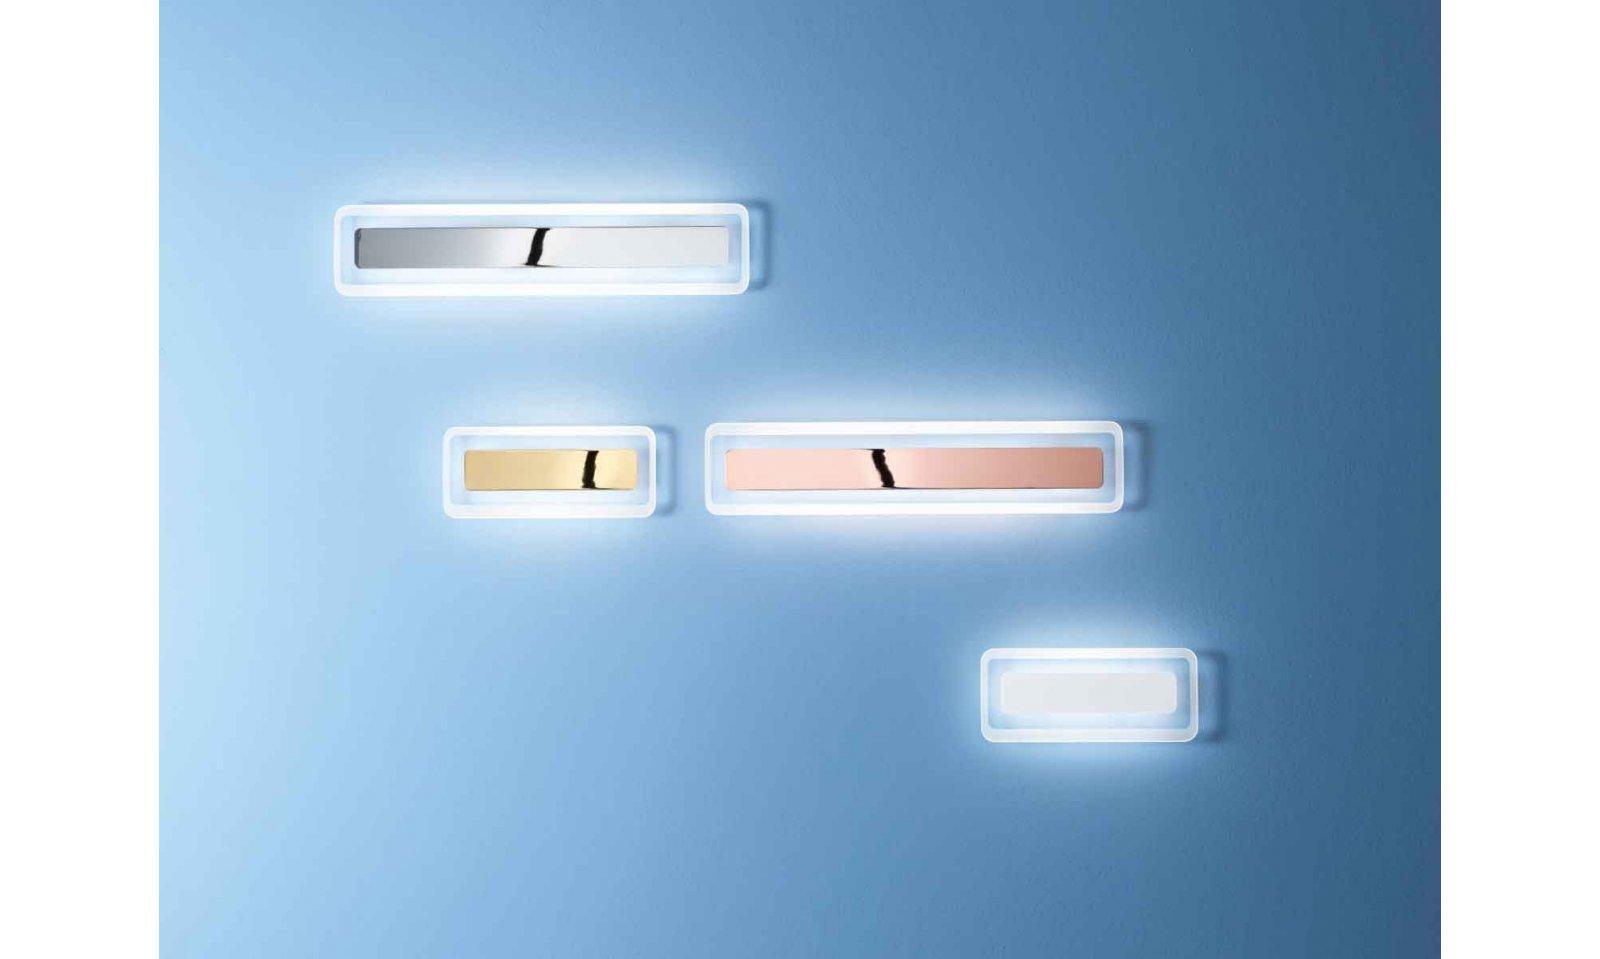 Linea light applique antille led lampada da parete con modulo led